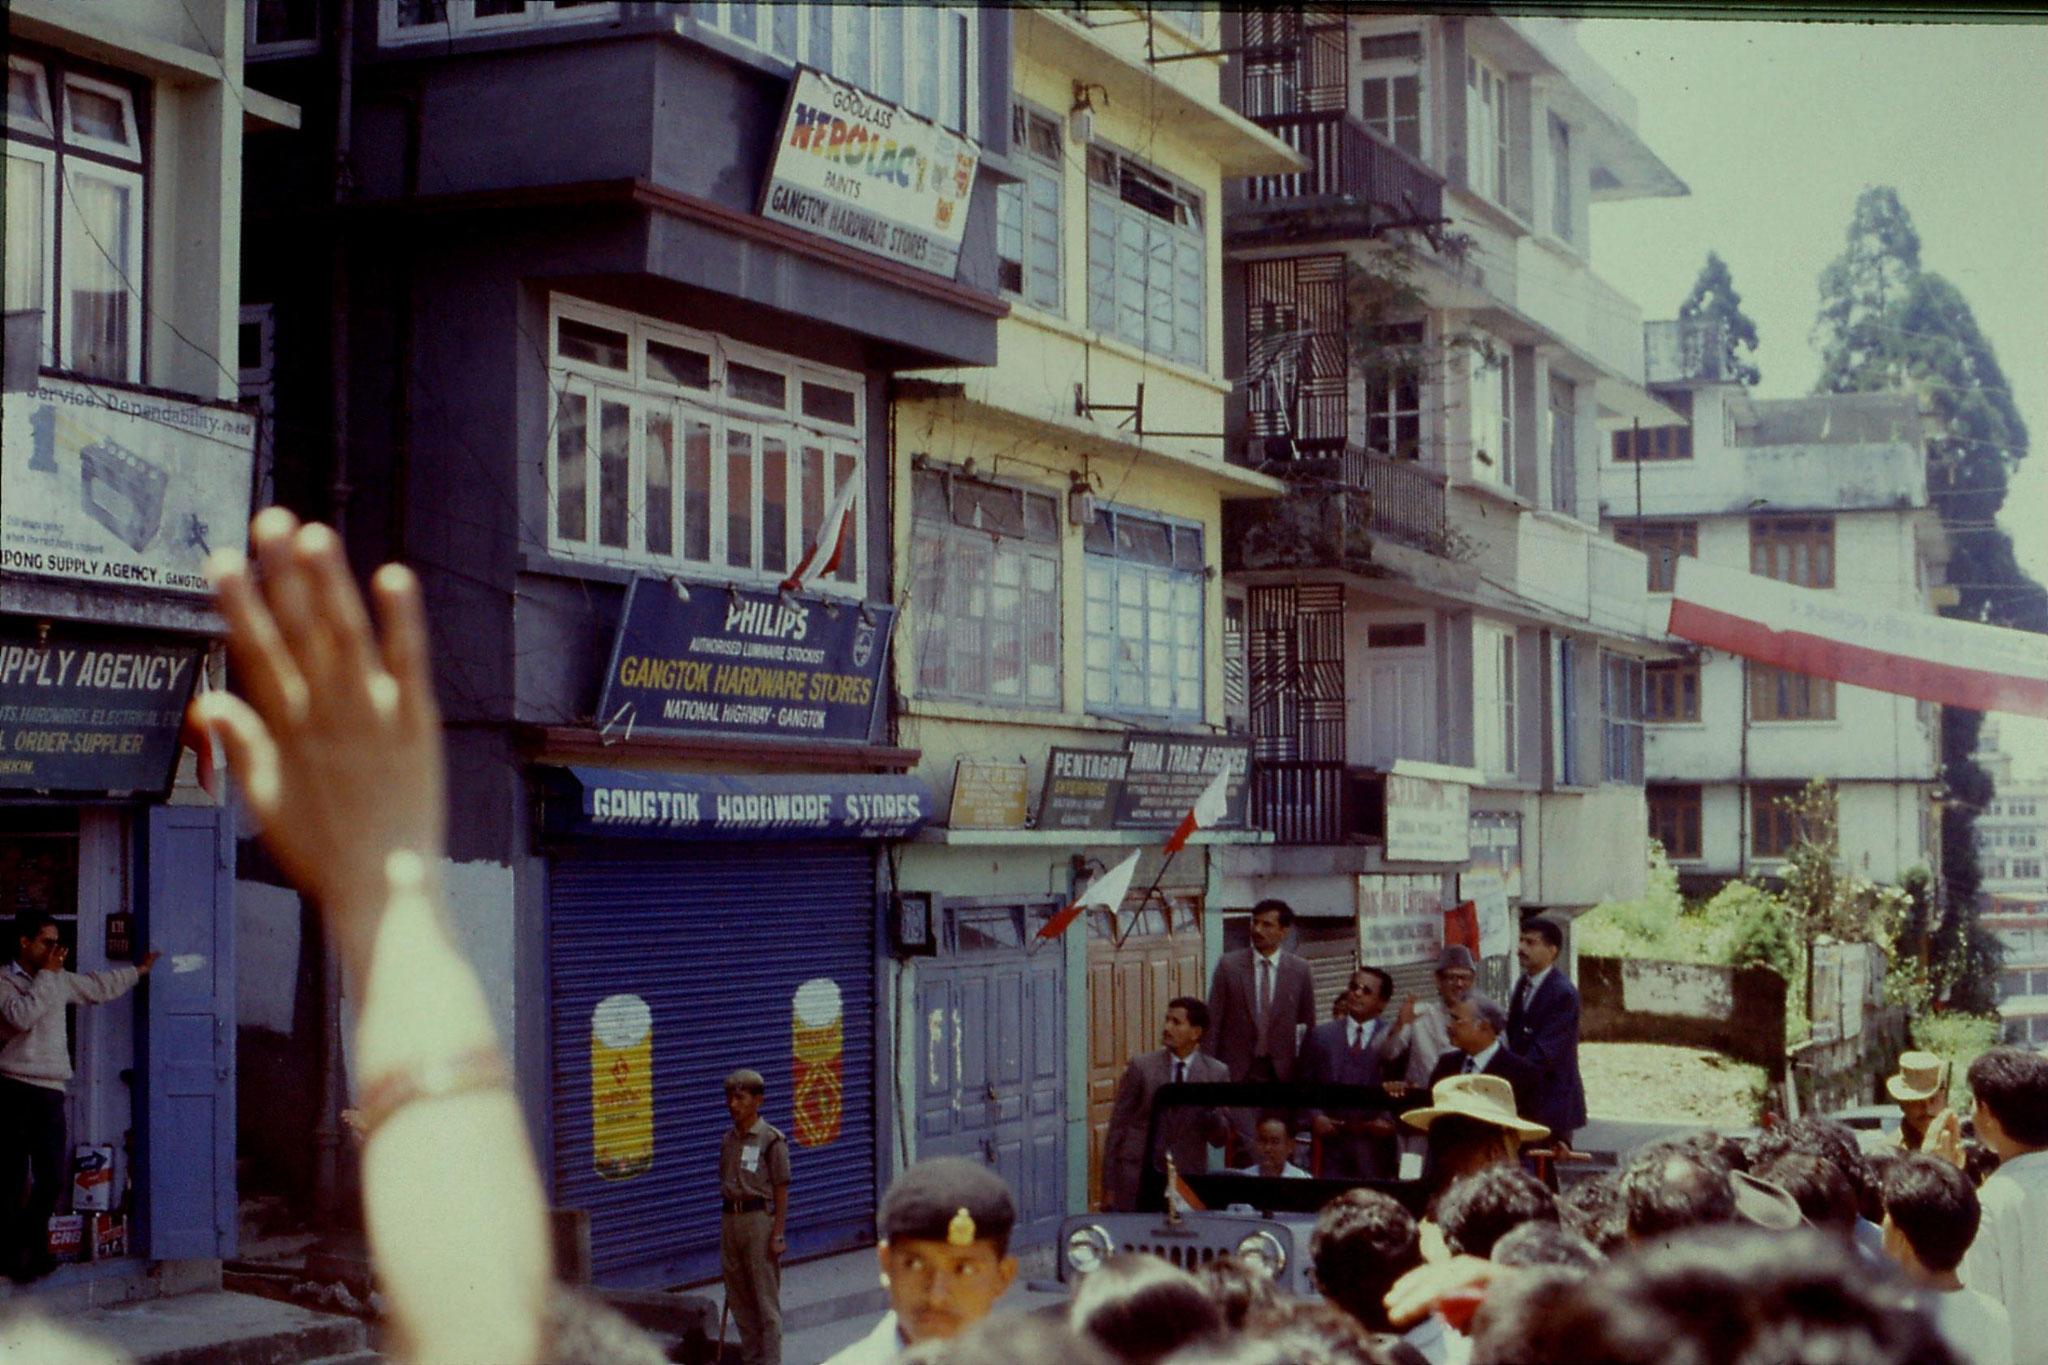 115/1: 22/4/1990 Gangtok (Sikkim) - V P Singh in jeep